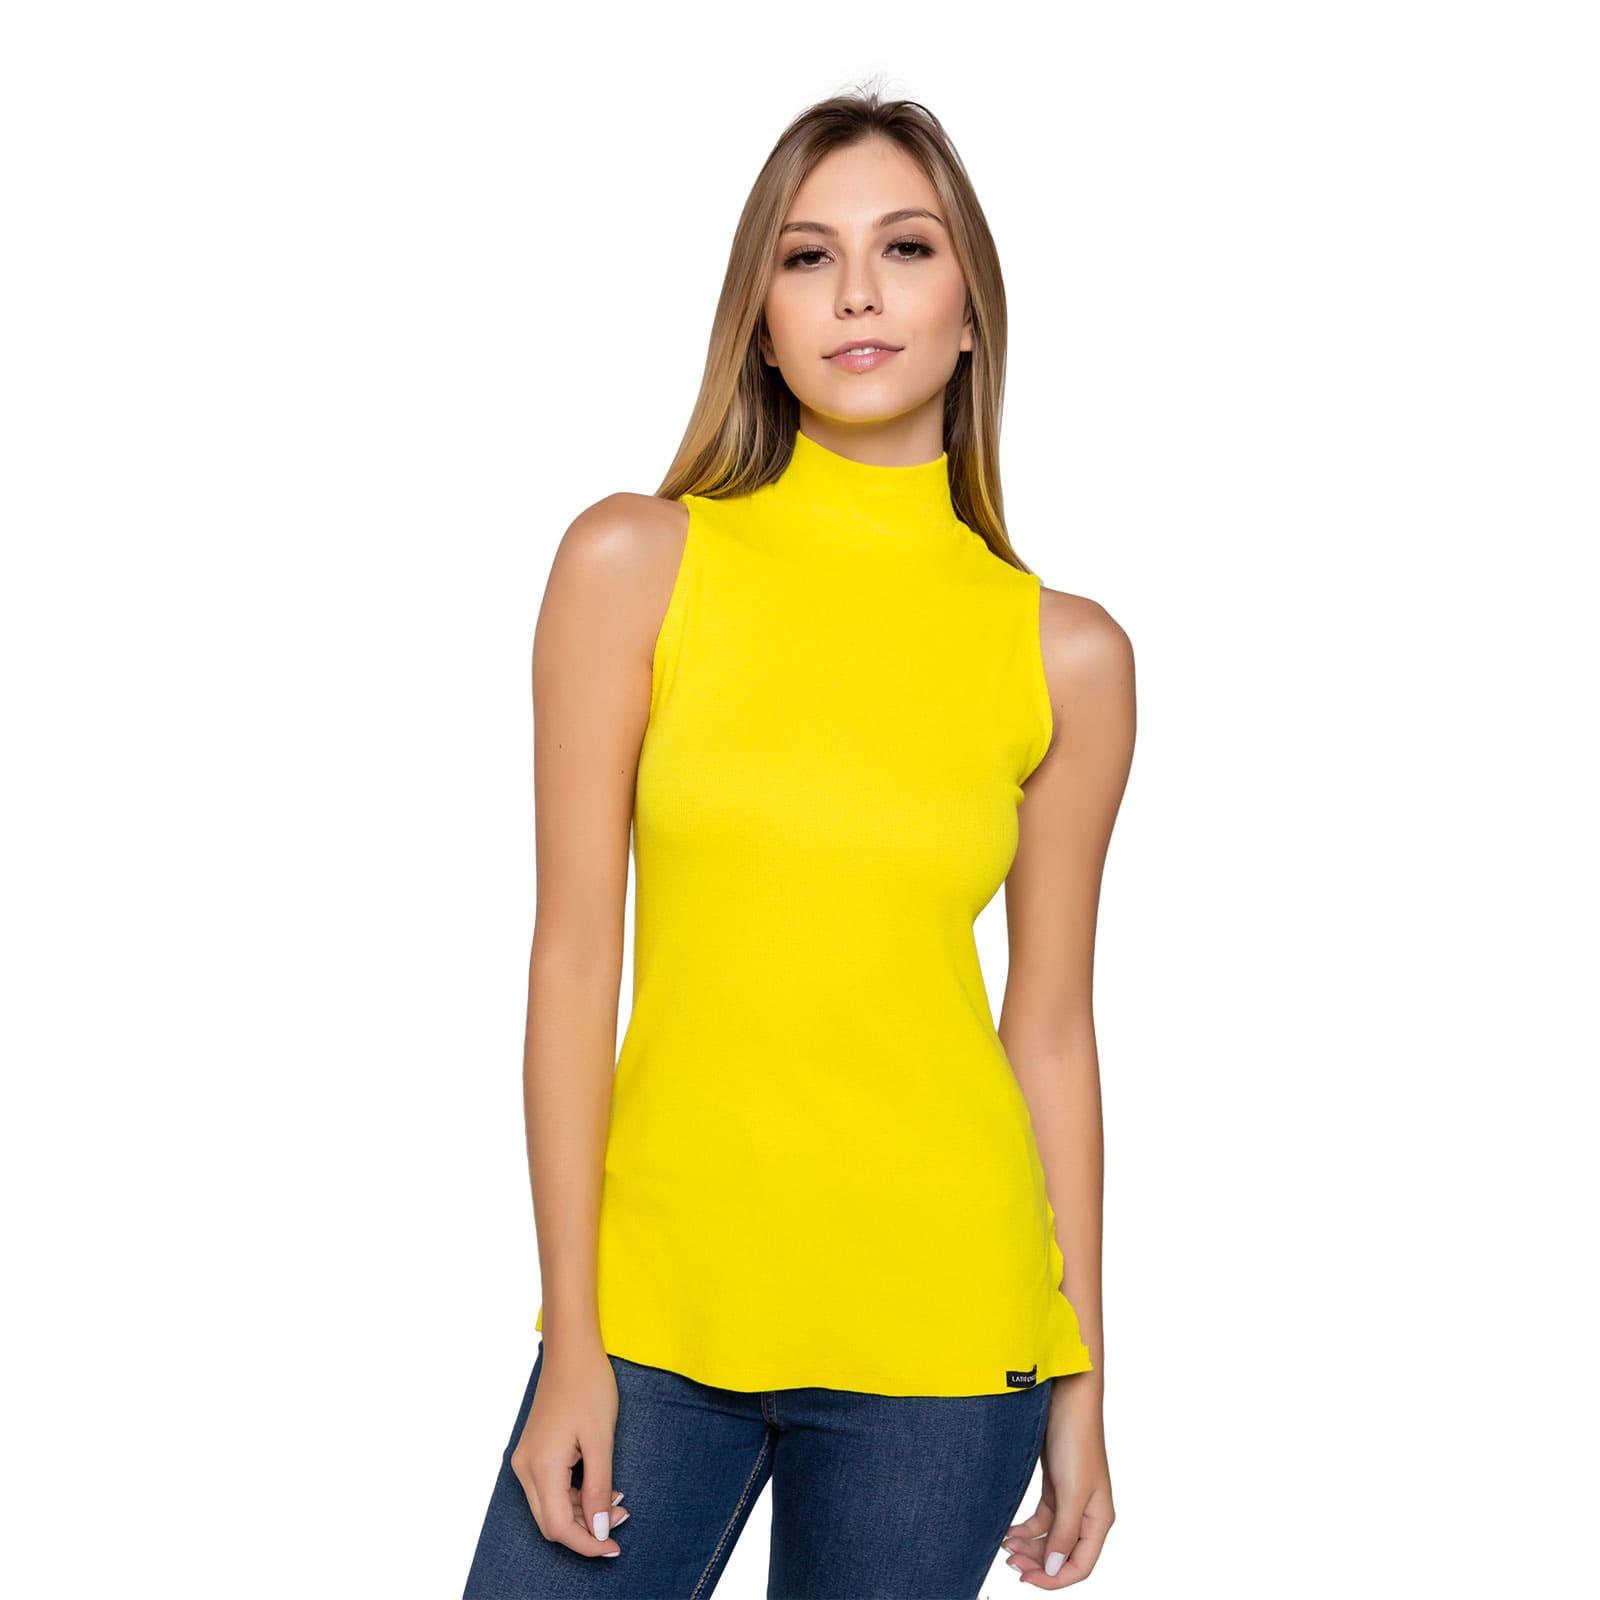 Blusa Feminina Gola Alta Amarelo